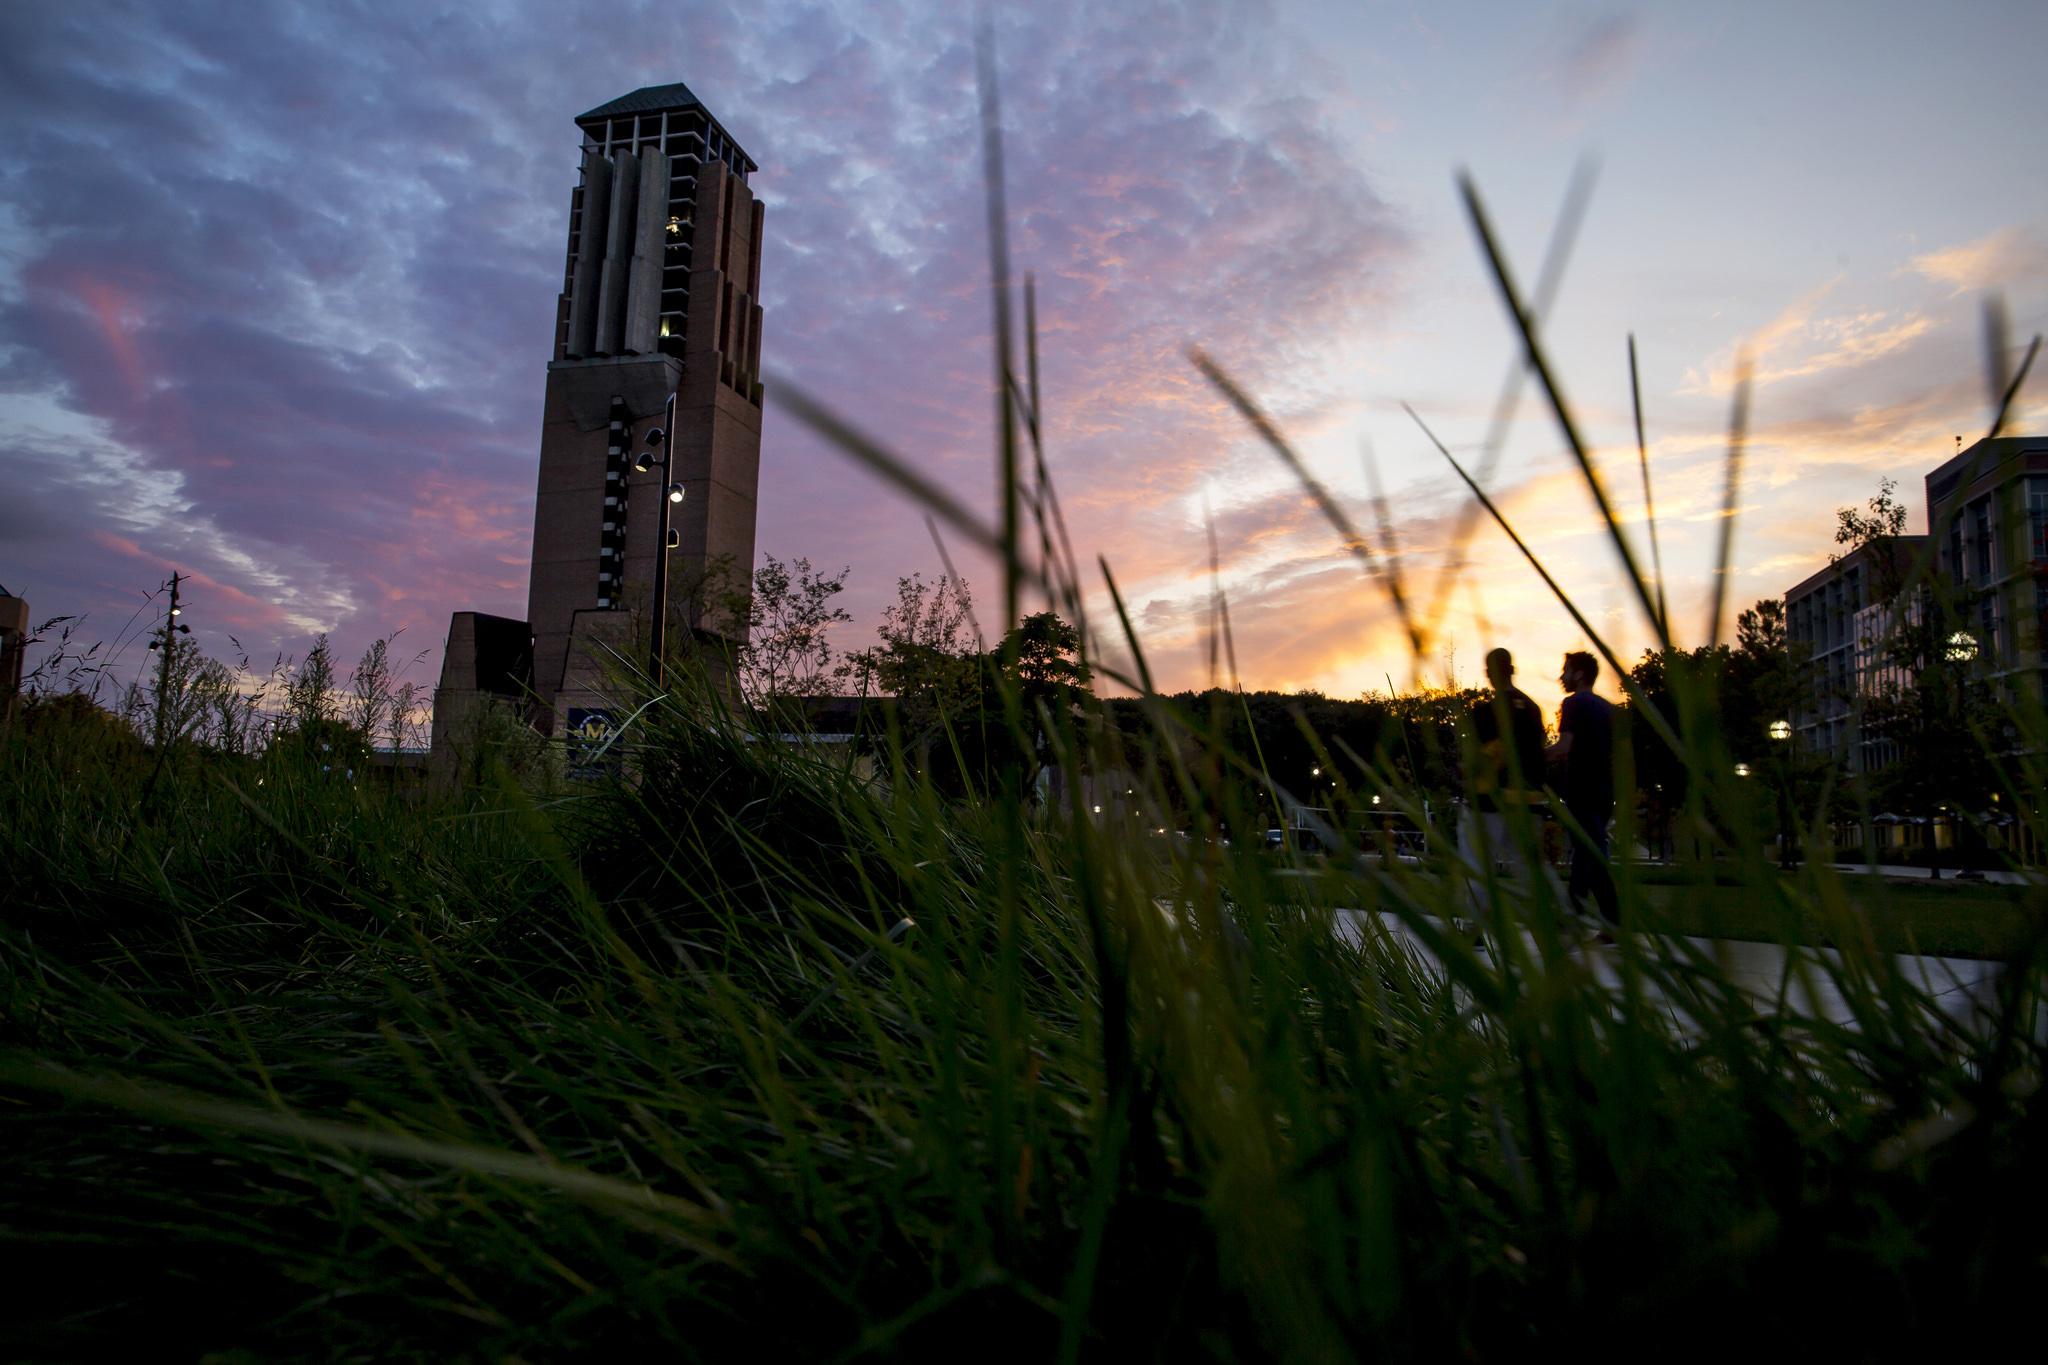 A photograph of the Eda U. Gerstacker Grove at sunset.